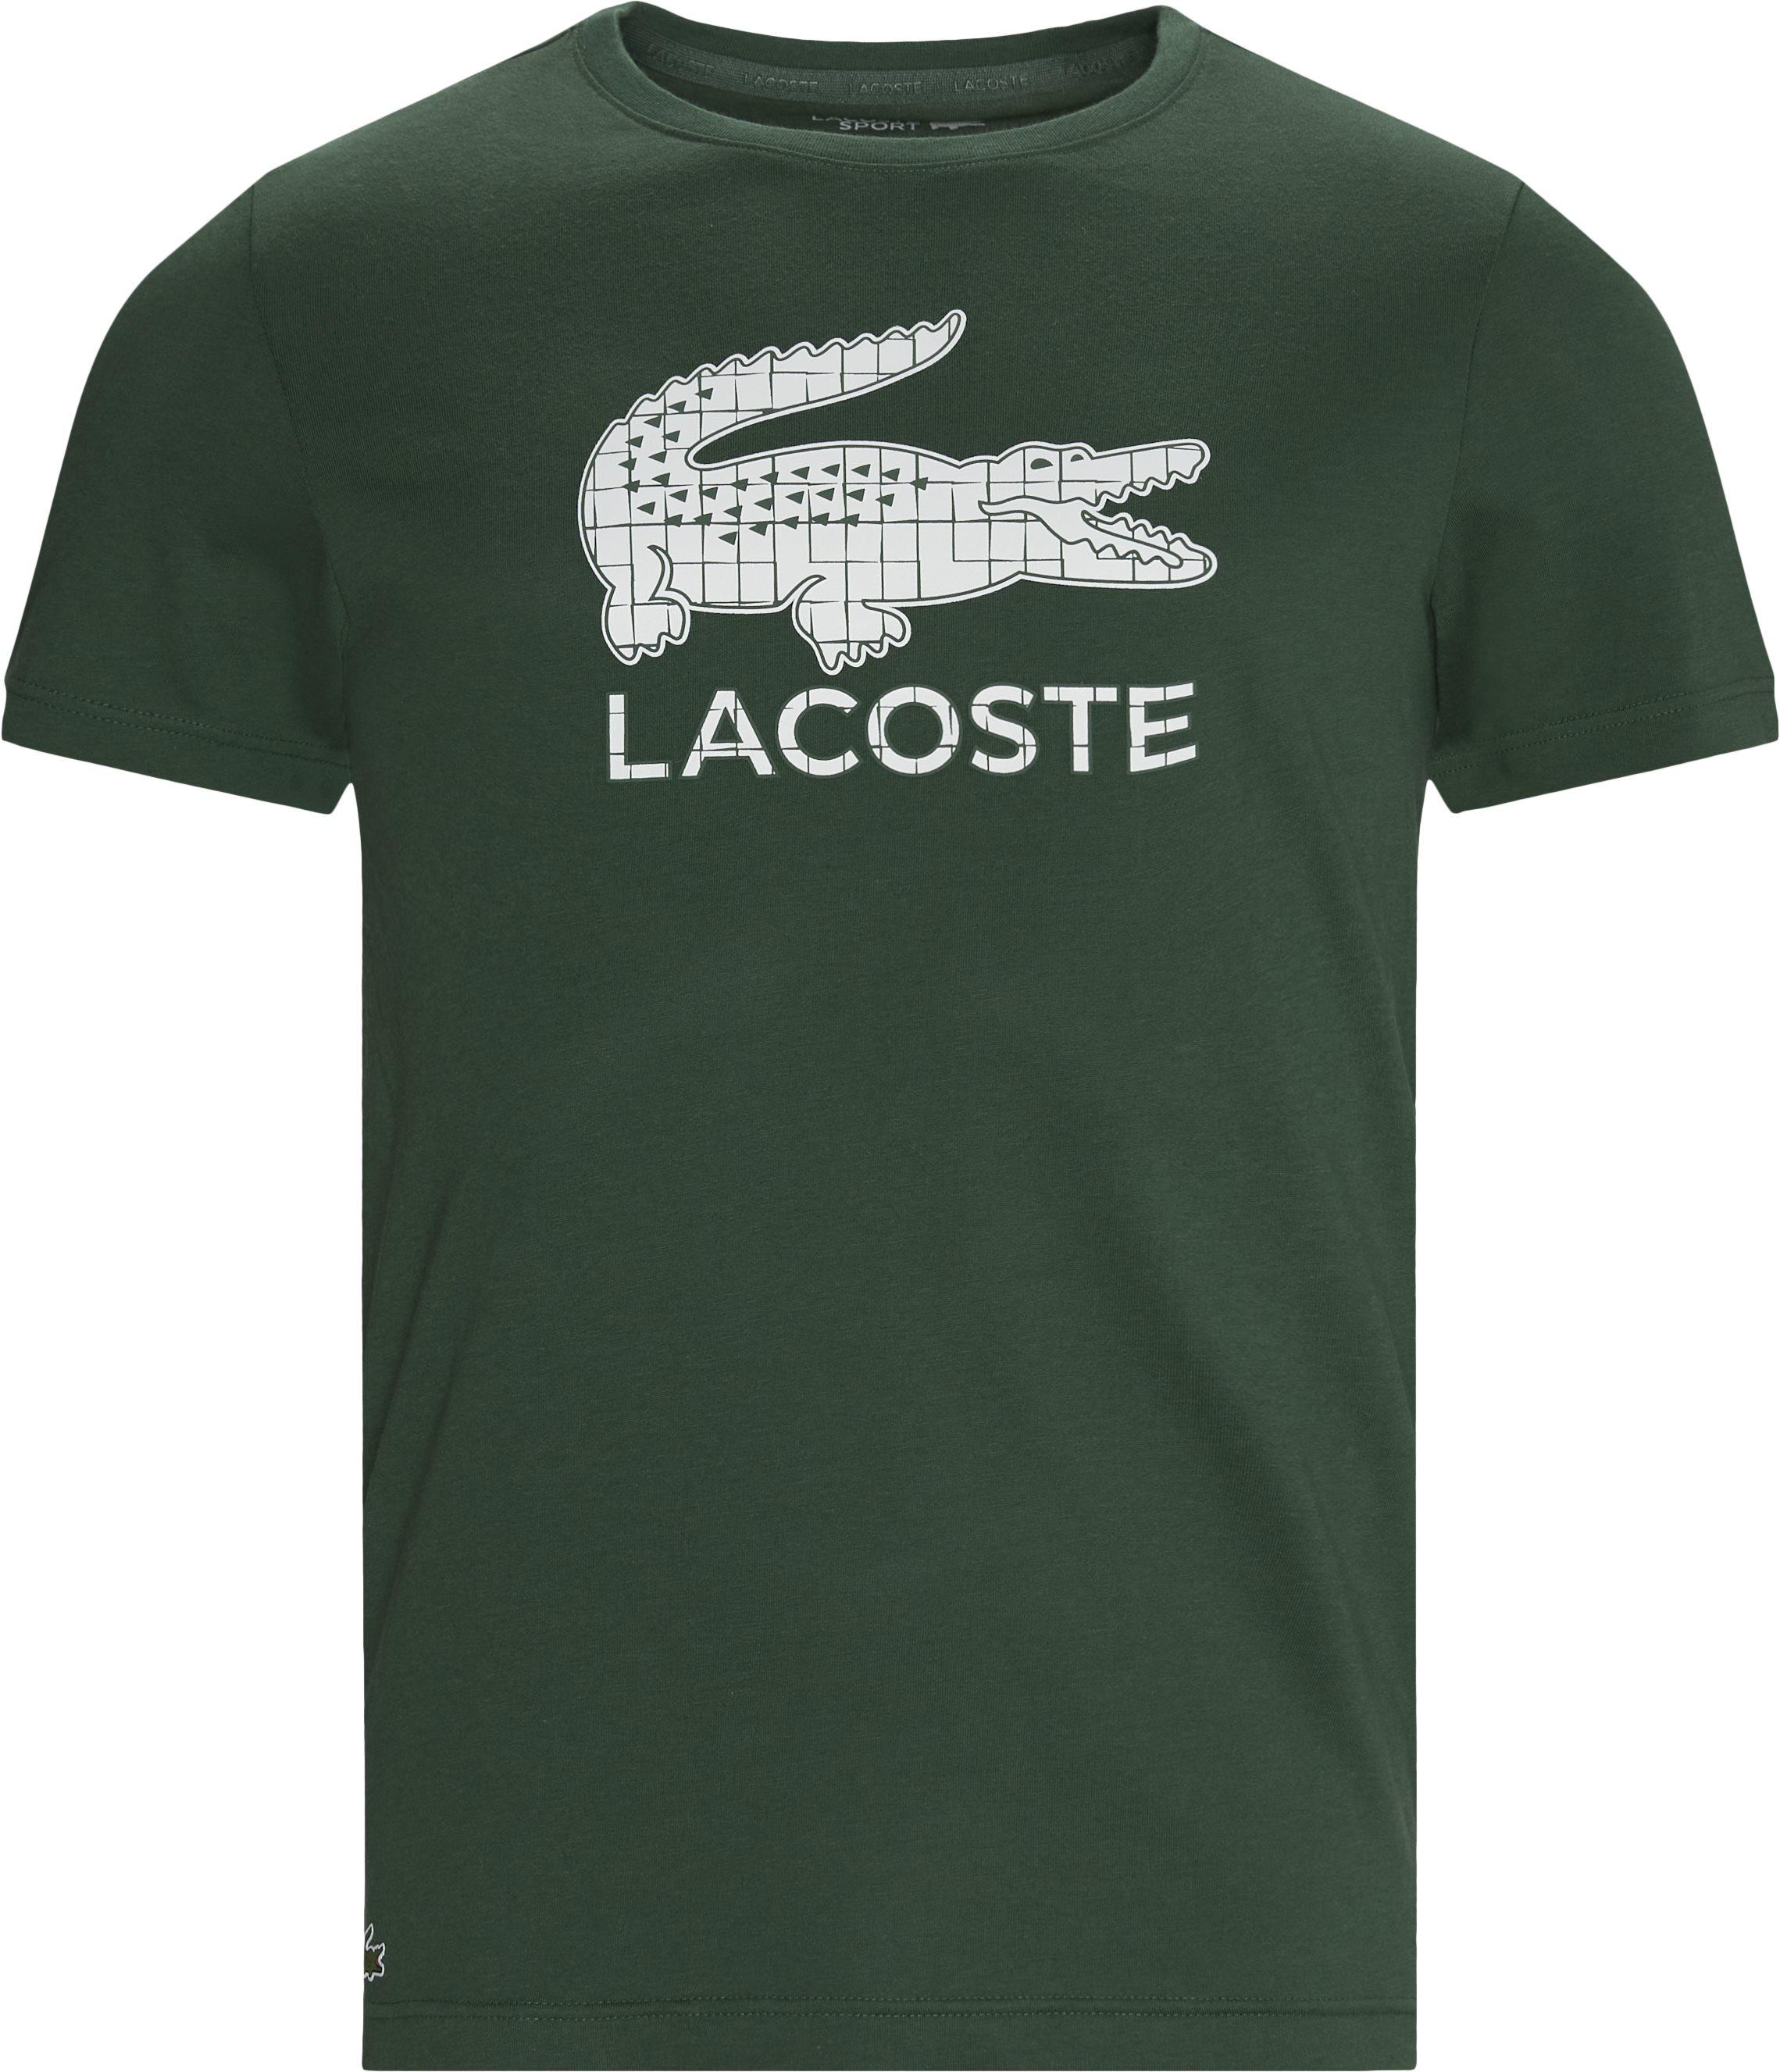 Crocodile Print Breathable Jersey T-shirt - T-shirts - Regular fit - Grøn